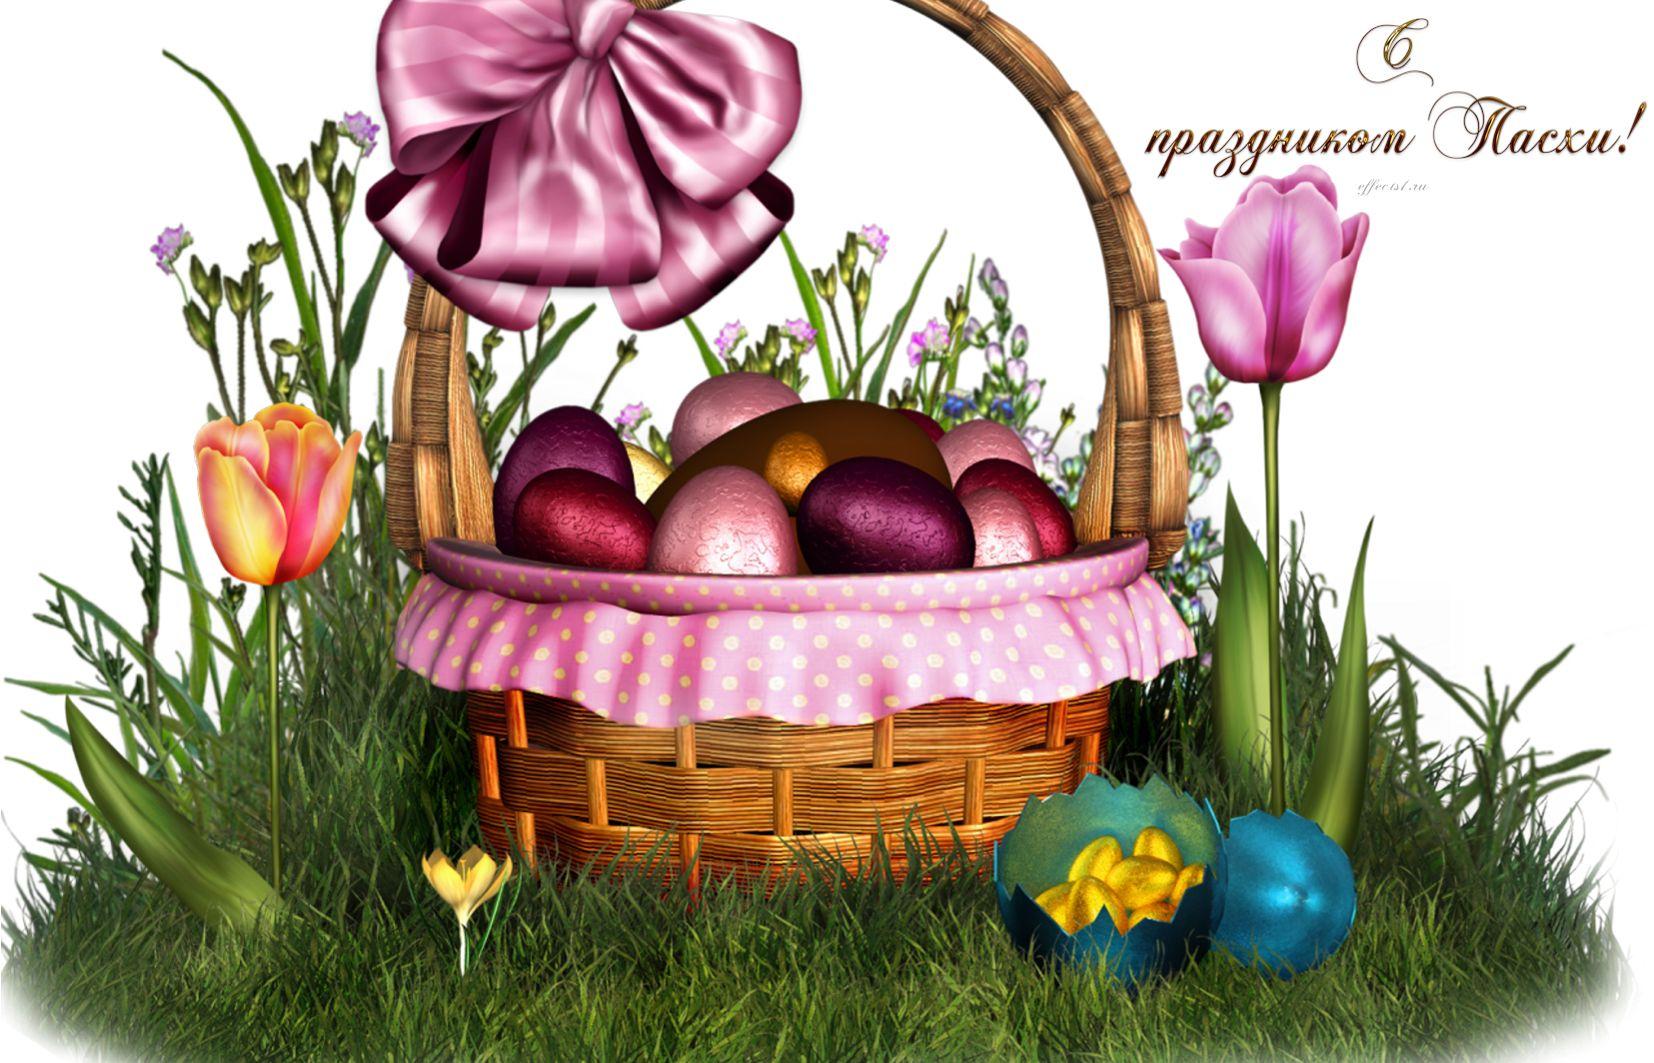 С праздником Пасхи, лукошко с яичками